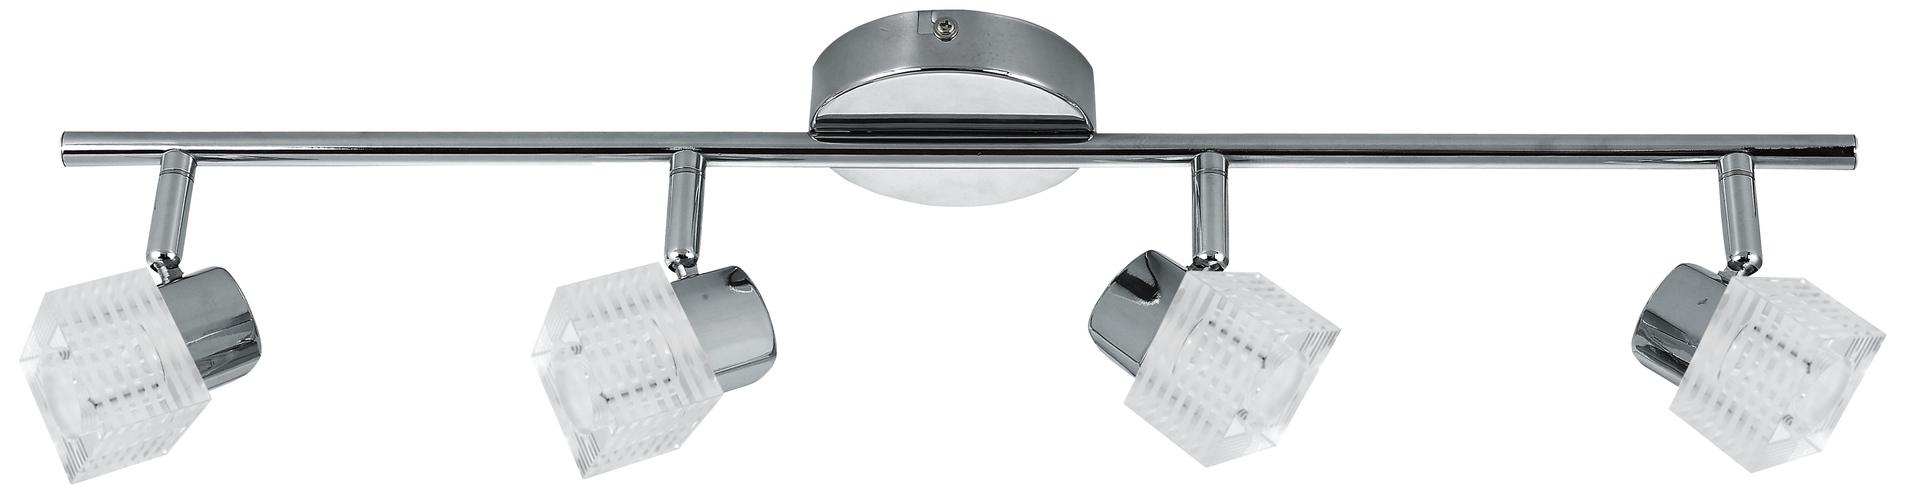 Lampa Malachit Listwa 4X40W G9